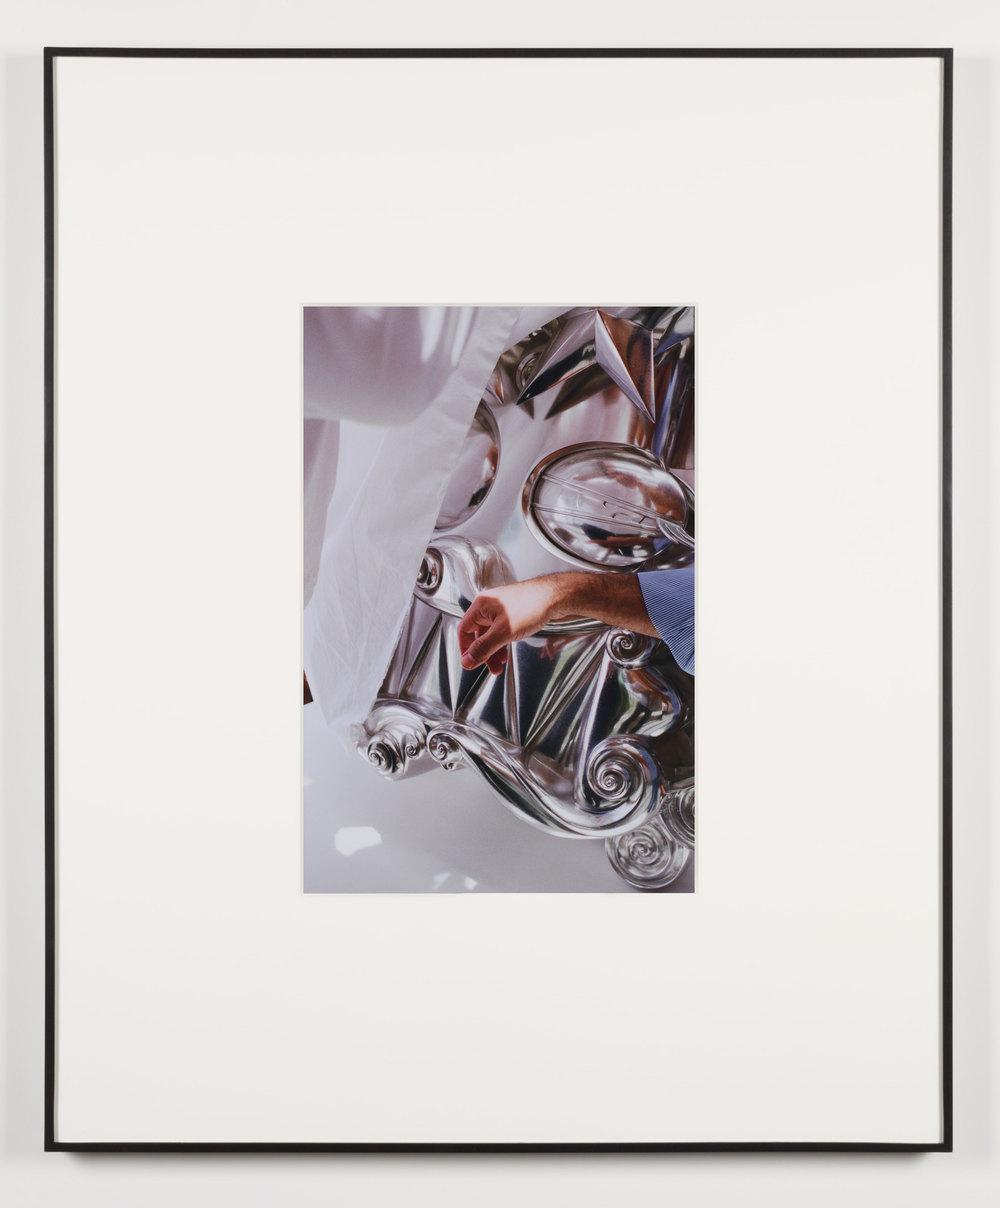 Schmerz (Beirut, Lebanon, June 1, 2013), Frame No. 14    2014   Chromogenic print  20 x 13 1/2 inches   Gastarbeiten, 2014